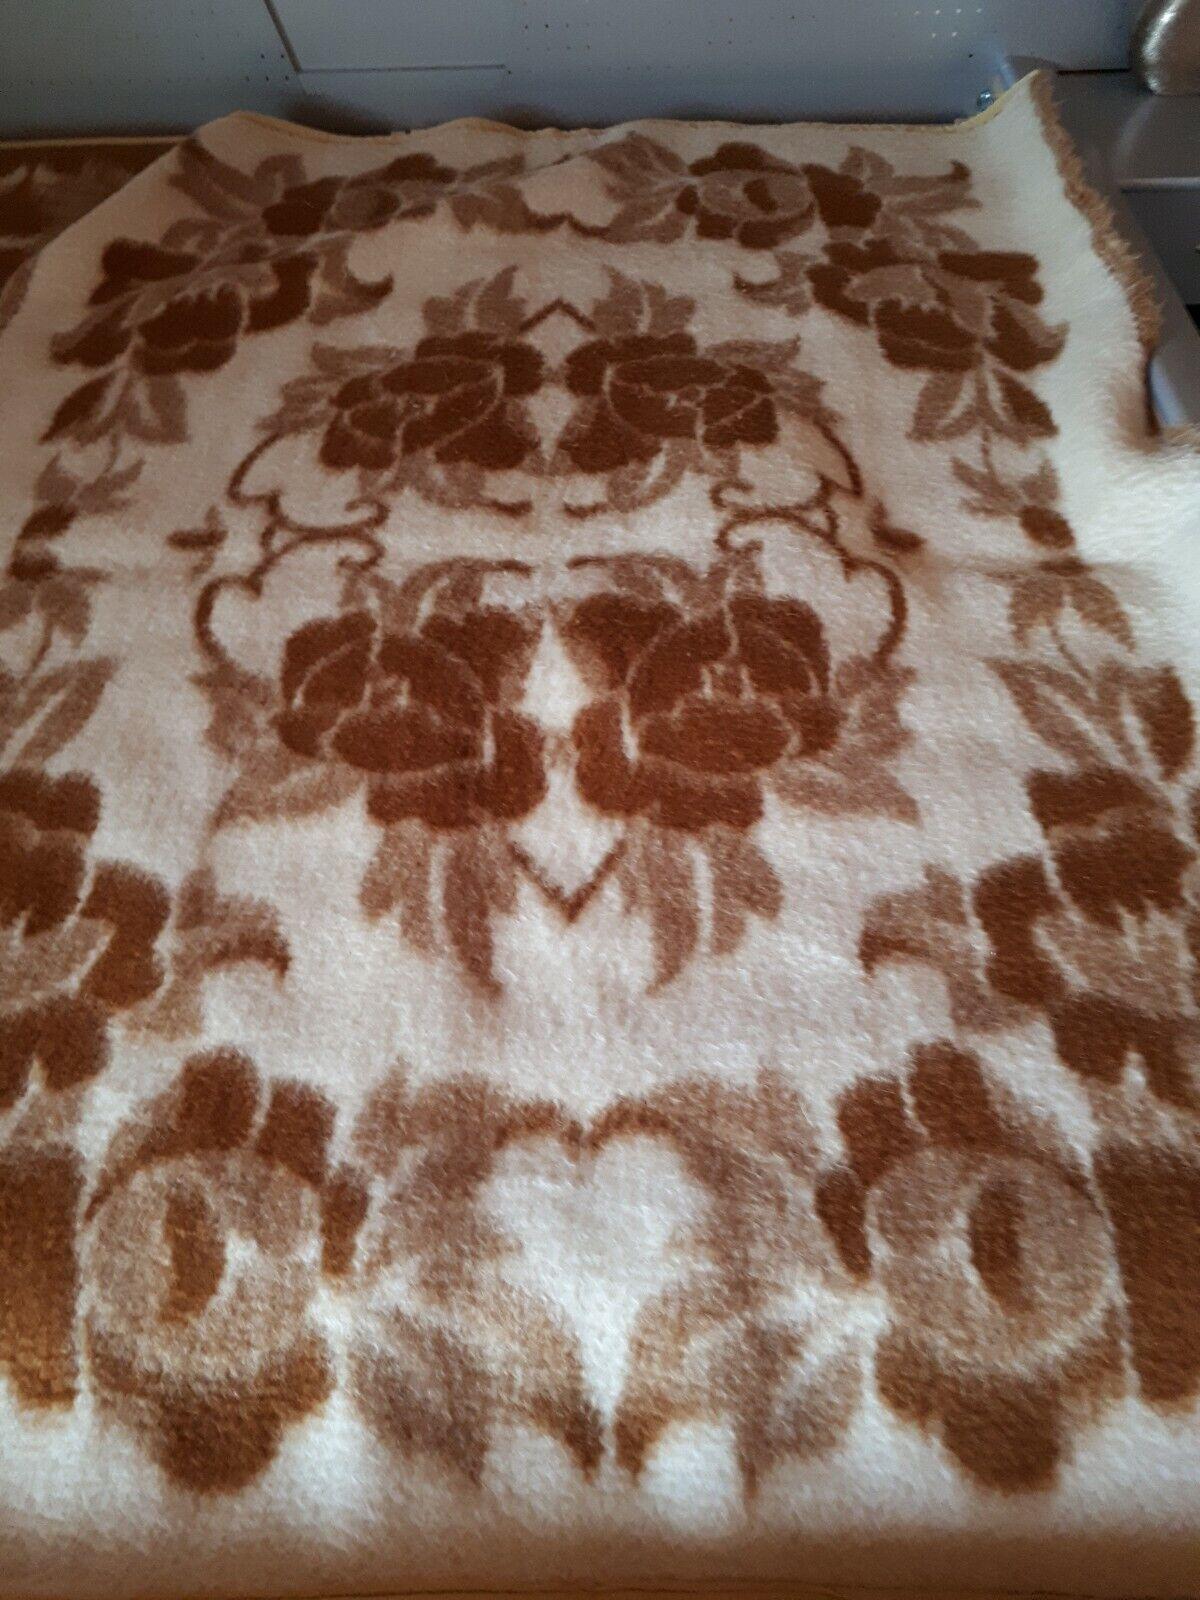 Lama Wolle Bettdecke ,Schlafdecke 140x190,BEAUTY PINE,made in China